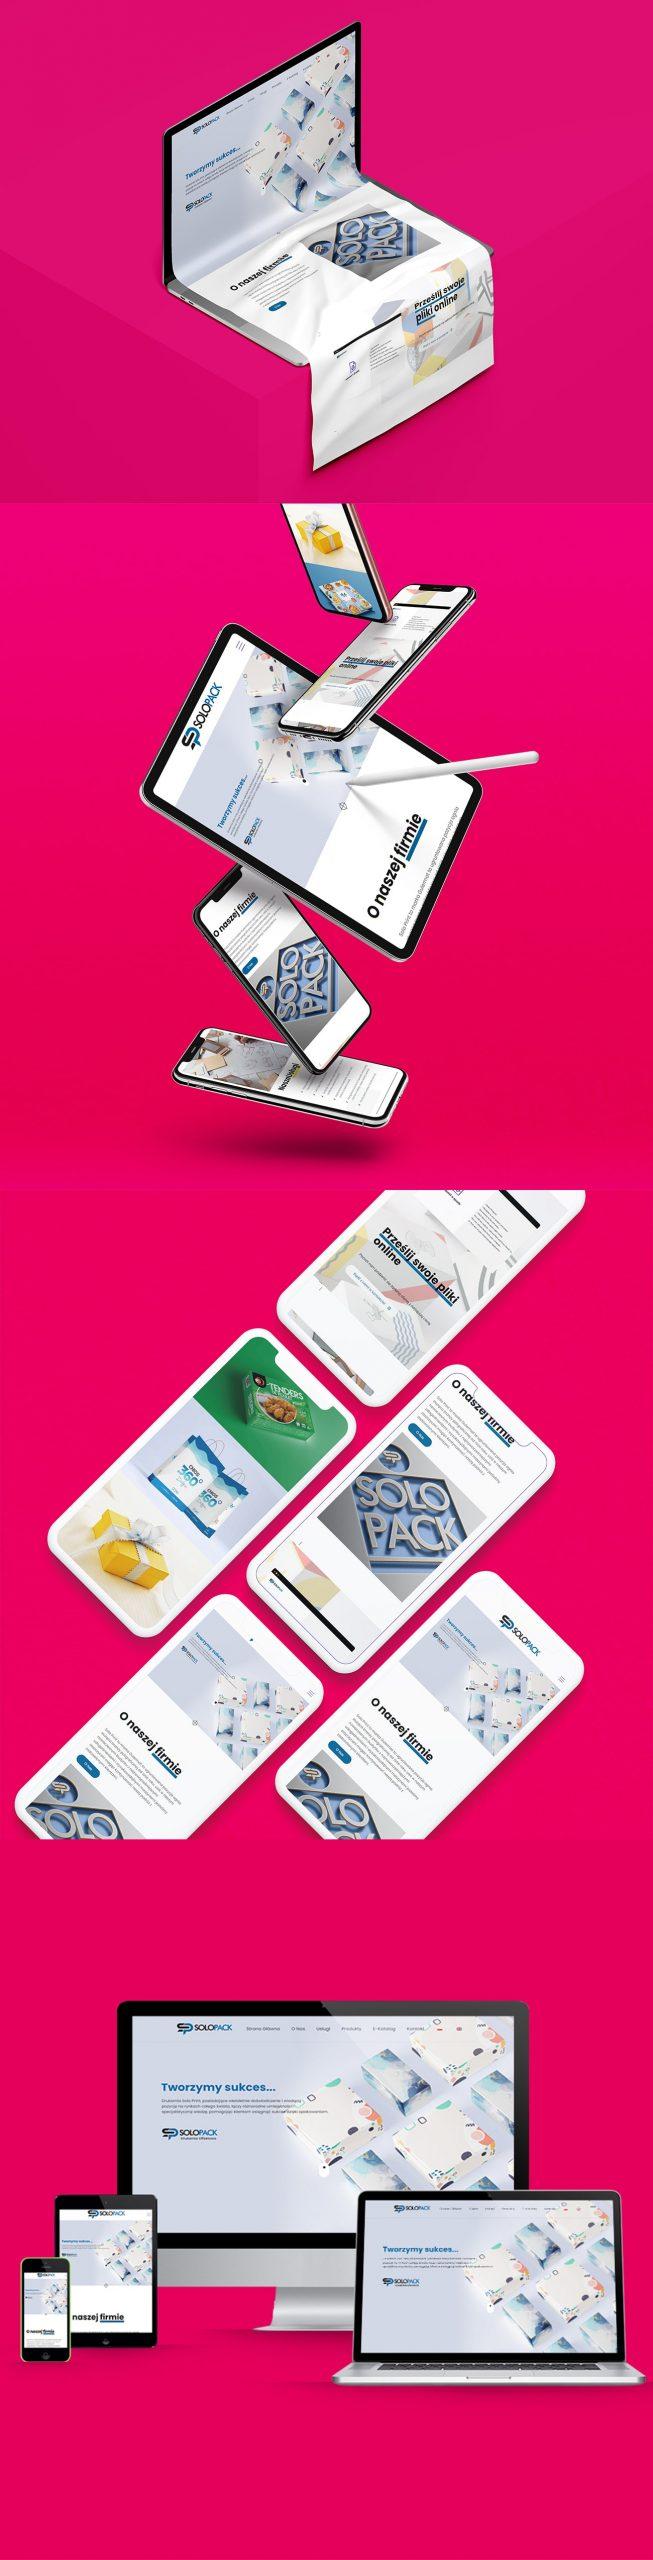 solopack-kurumsal-web-tasarim